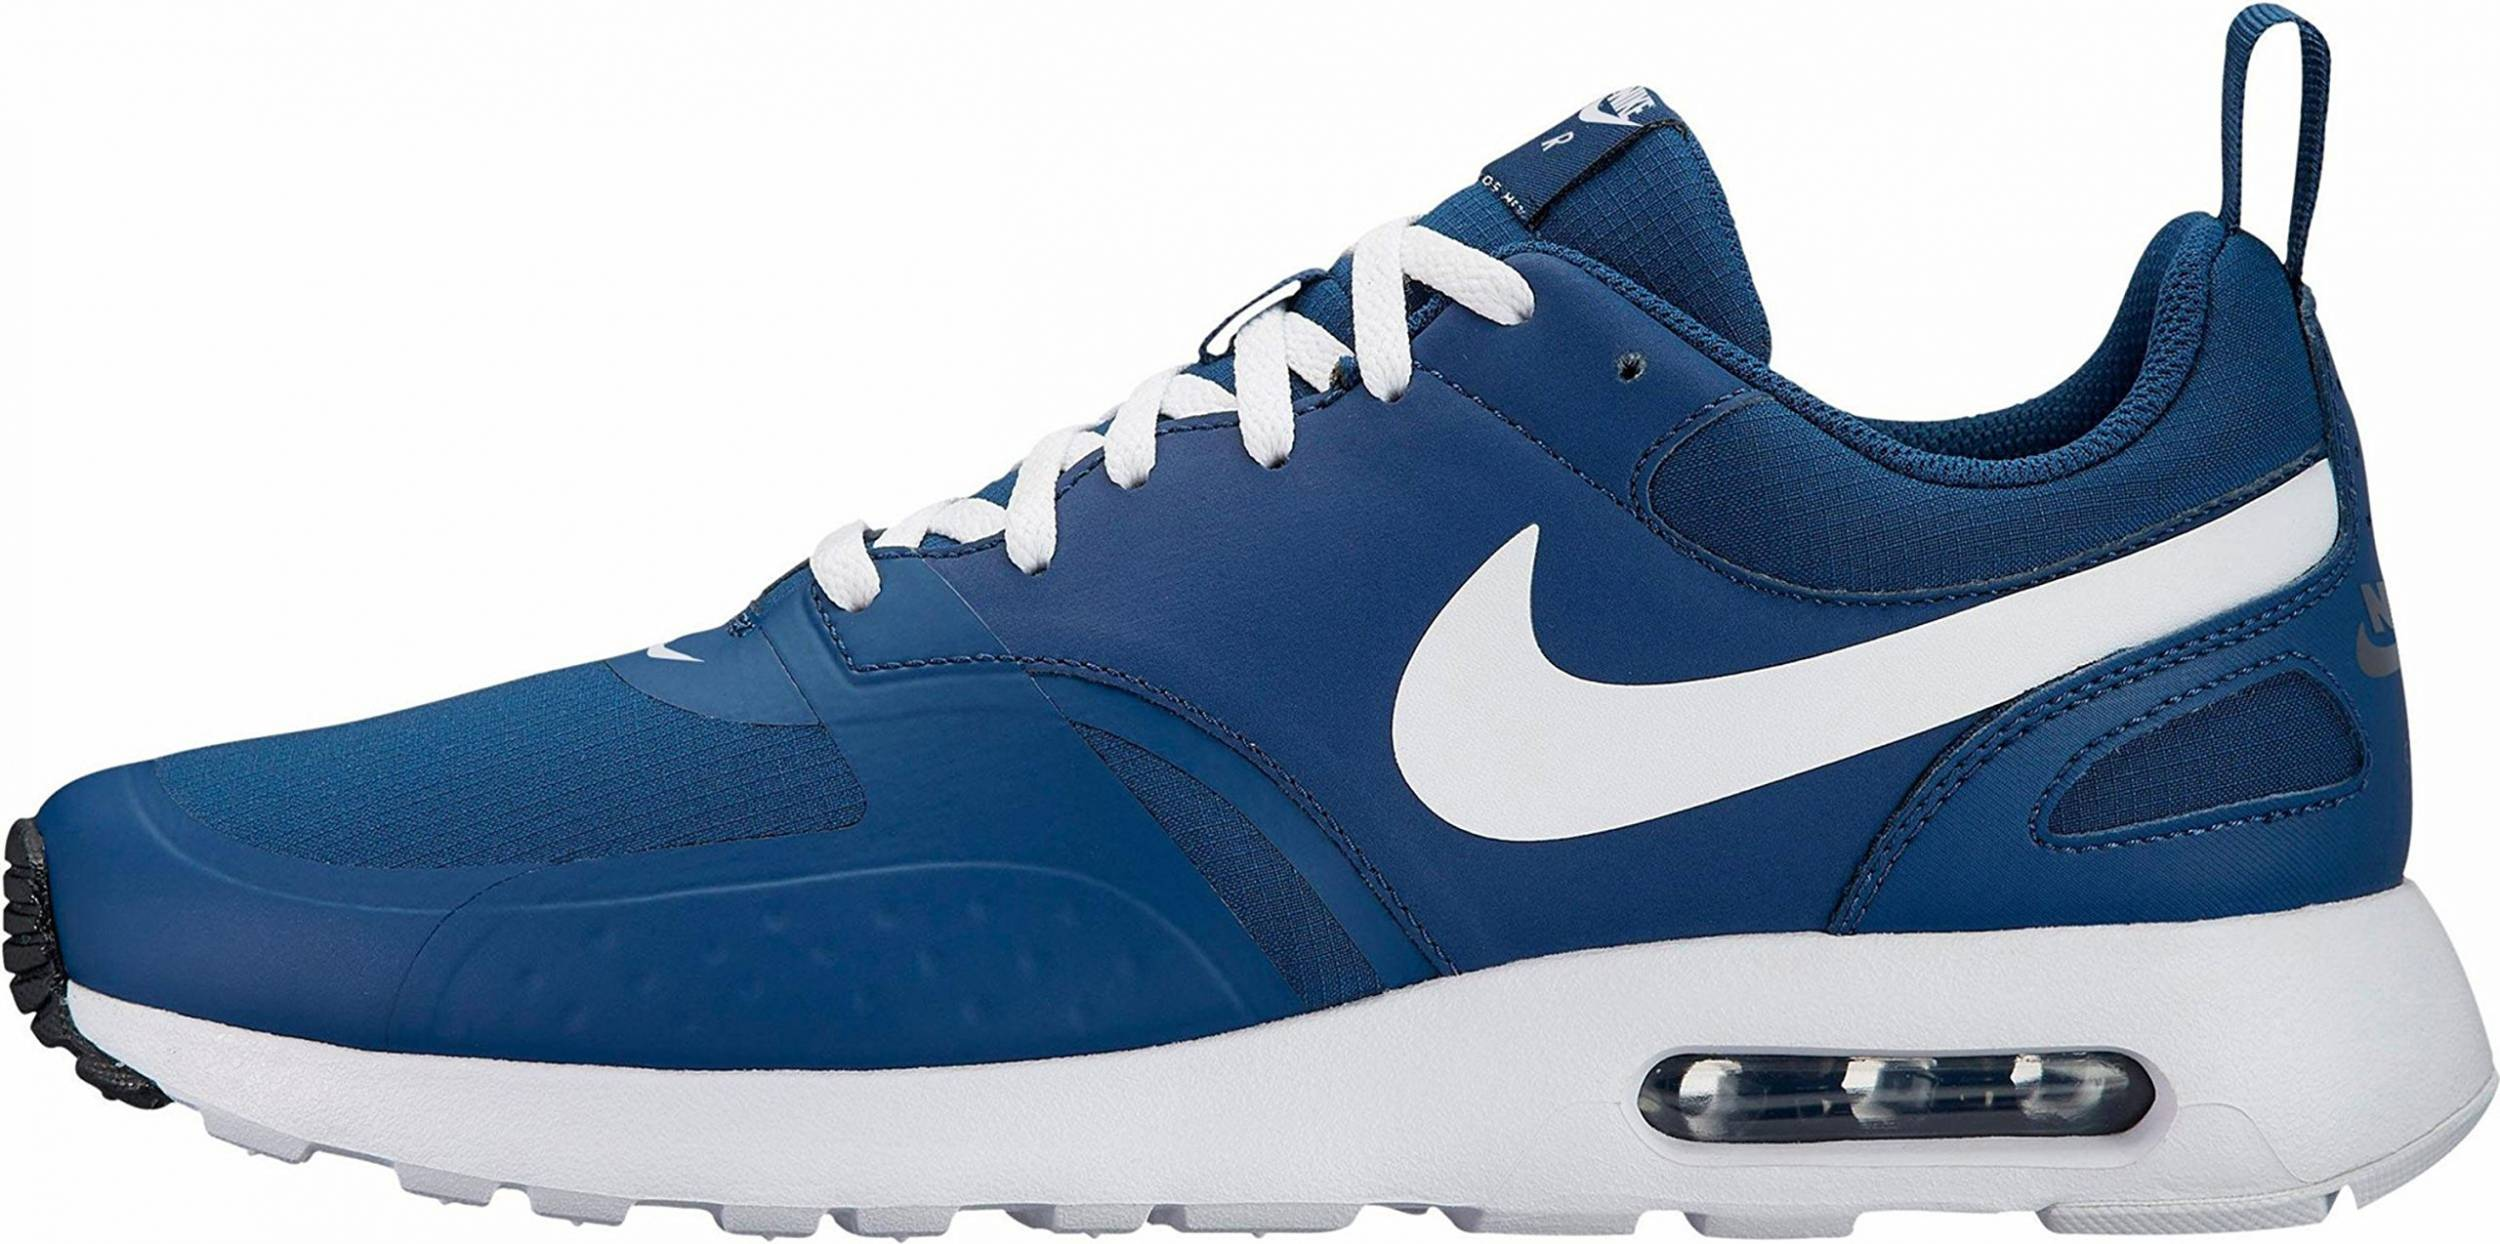 Calor Envolver Apellido  Nike Air Max Vision sneakers in 4 colors (only $85)   RunRepeat